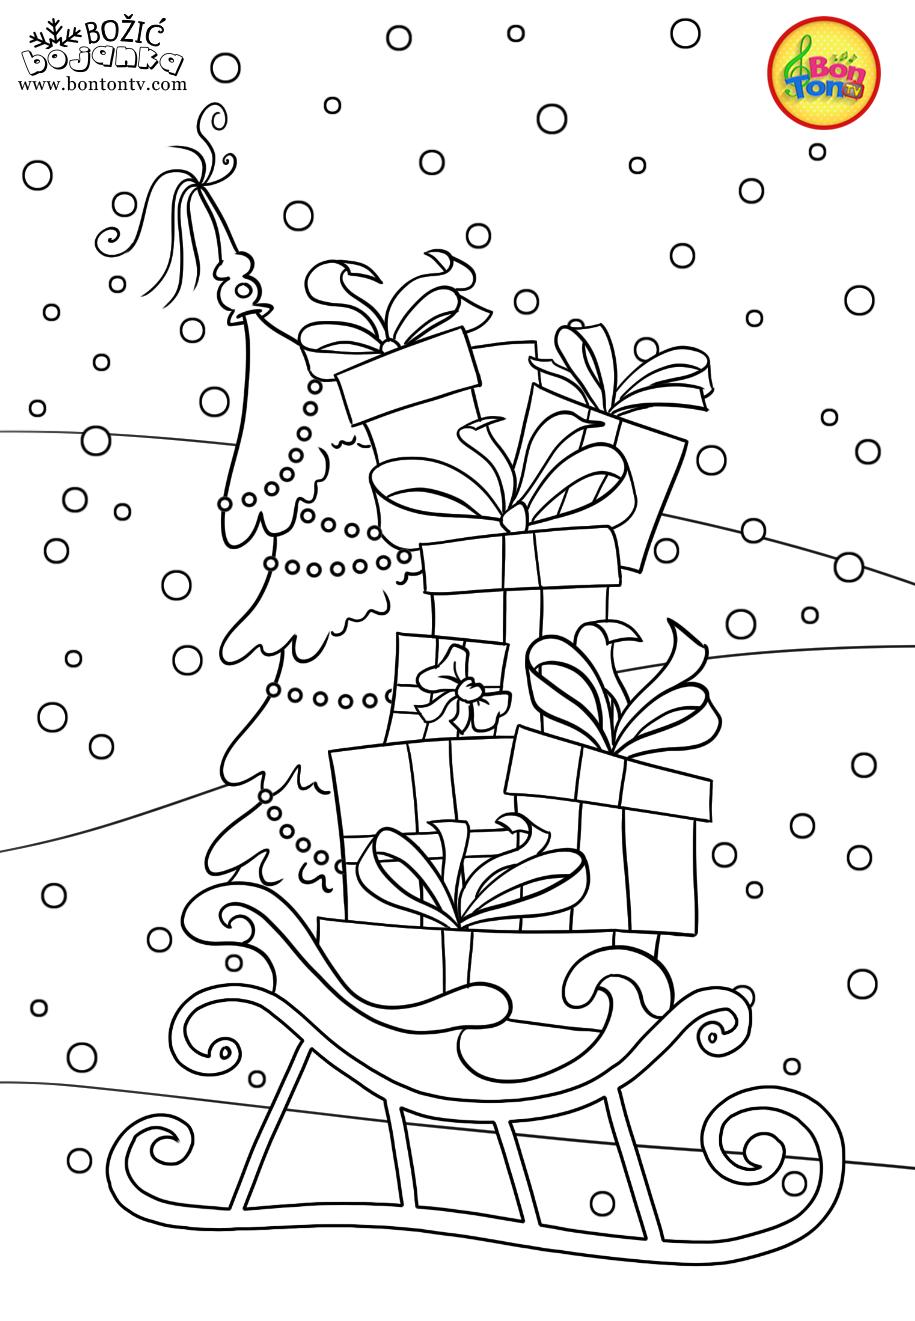 Christmas Coloring Pages   Božić bojanke za djecu   Free ...